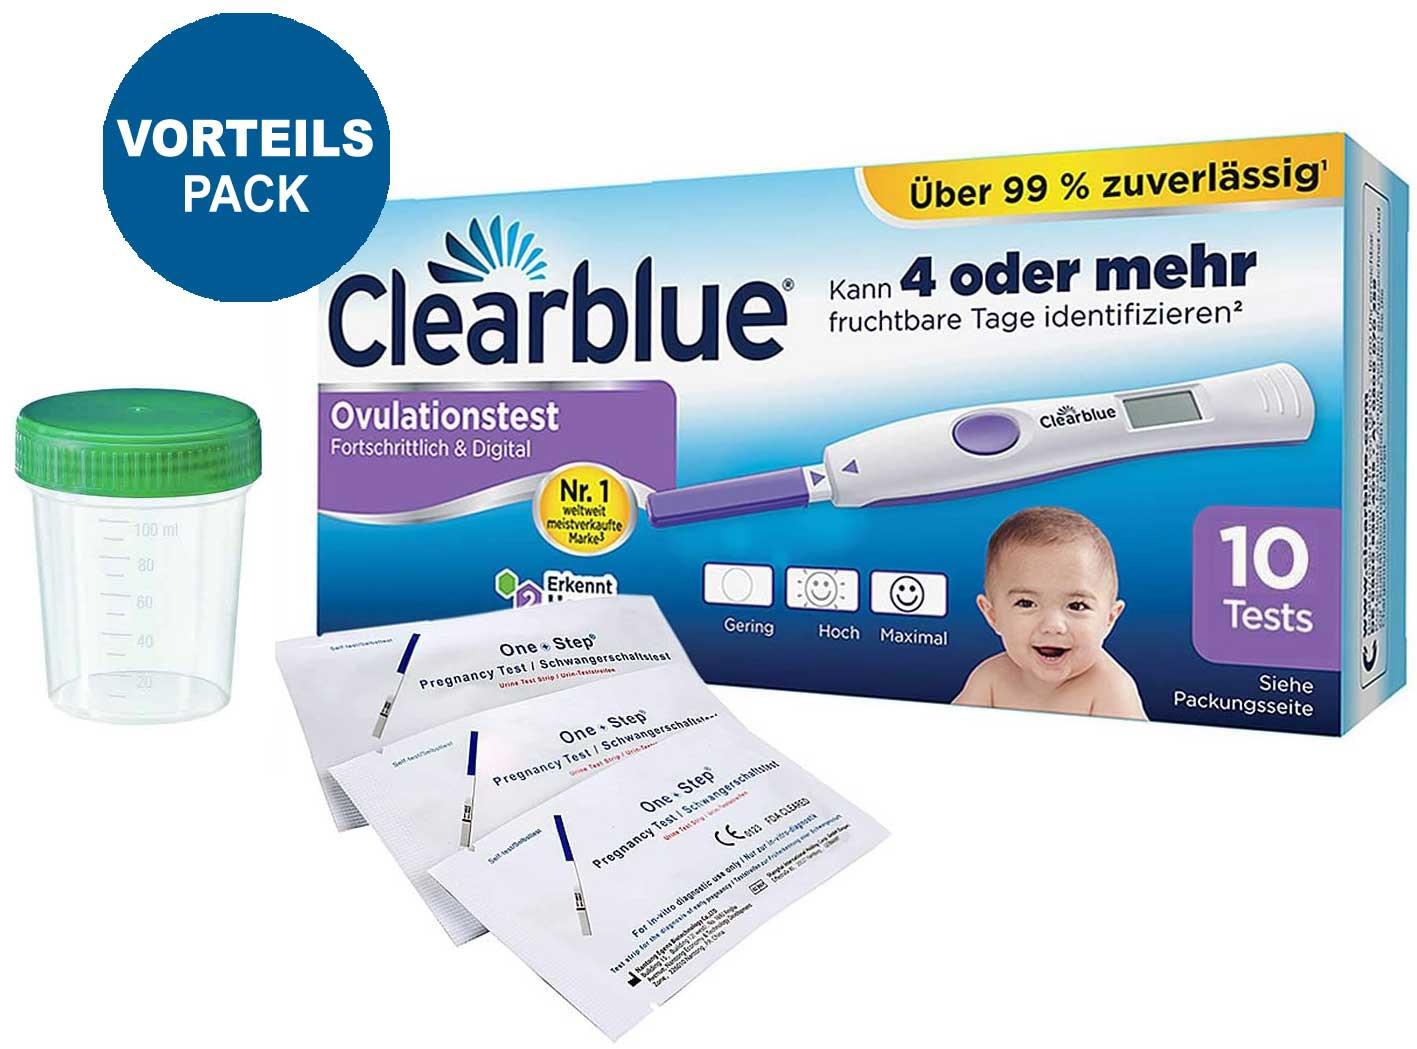 Clearblue Ovulationstest Fortschrittlich & Digital, 10 Tests, 1er Pack (1 x 10 Stück) plus 10 OneStep Schwangerschaftstests 10 miu_ Amazon.de_ Drogerie & Körperpflege